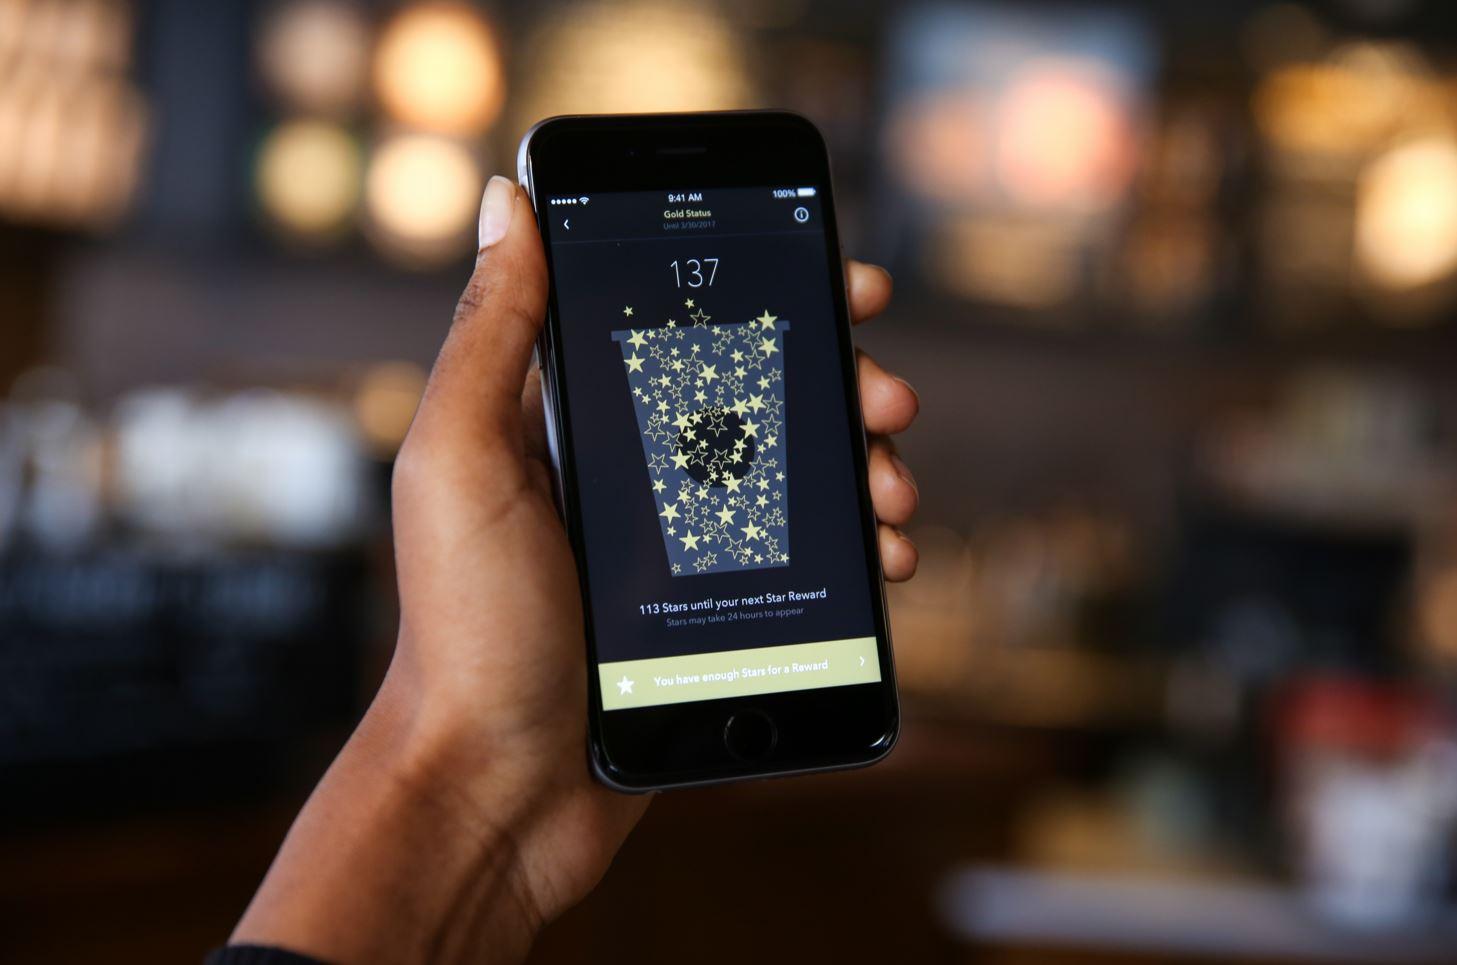 Free Weekly Paid iOS Apps through Starbucks app - Pick of the Week